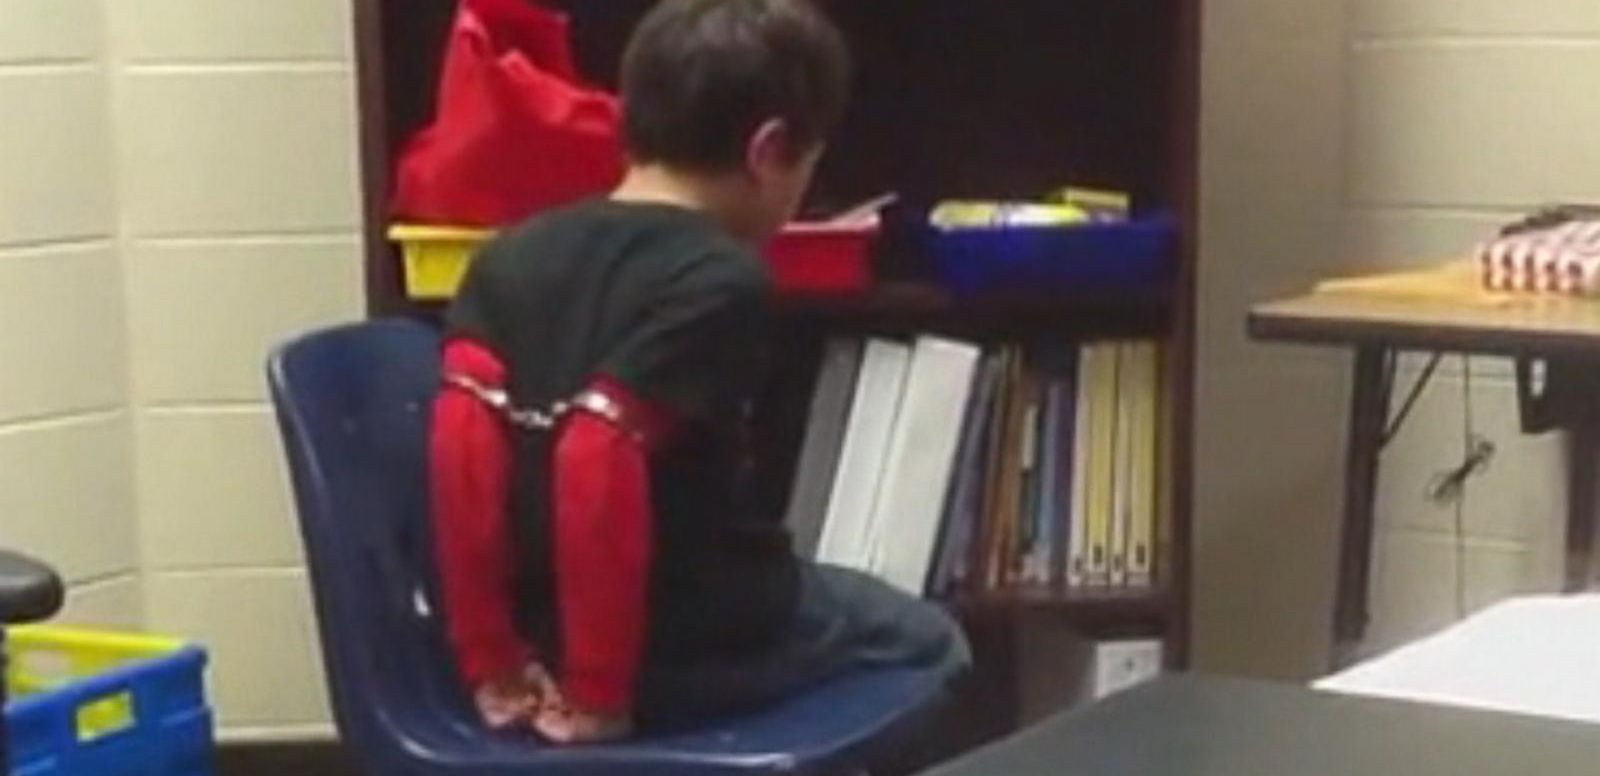 Kentucky Sherriff Used Handcuffs on 'Misbehaving' 3rd-Grader